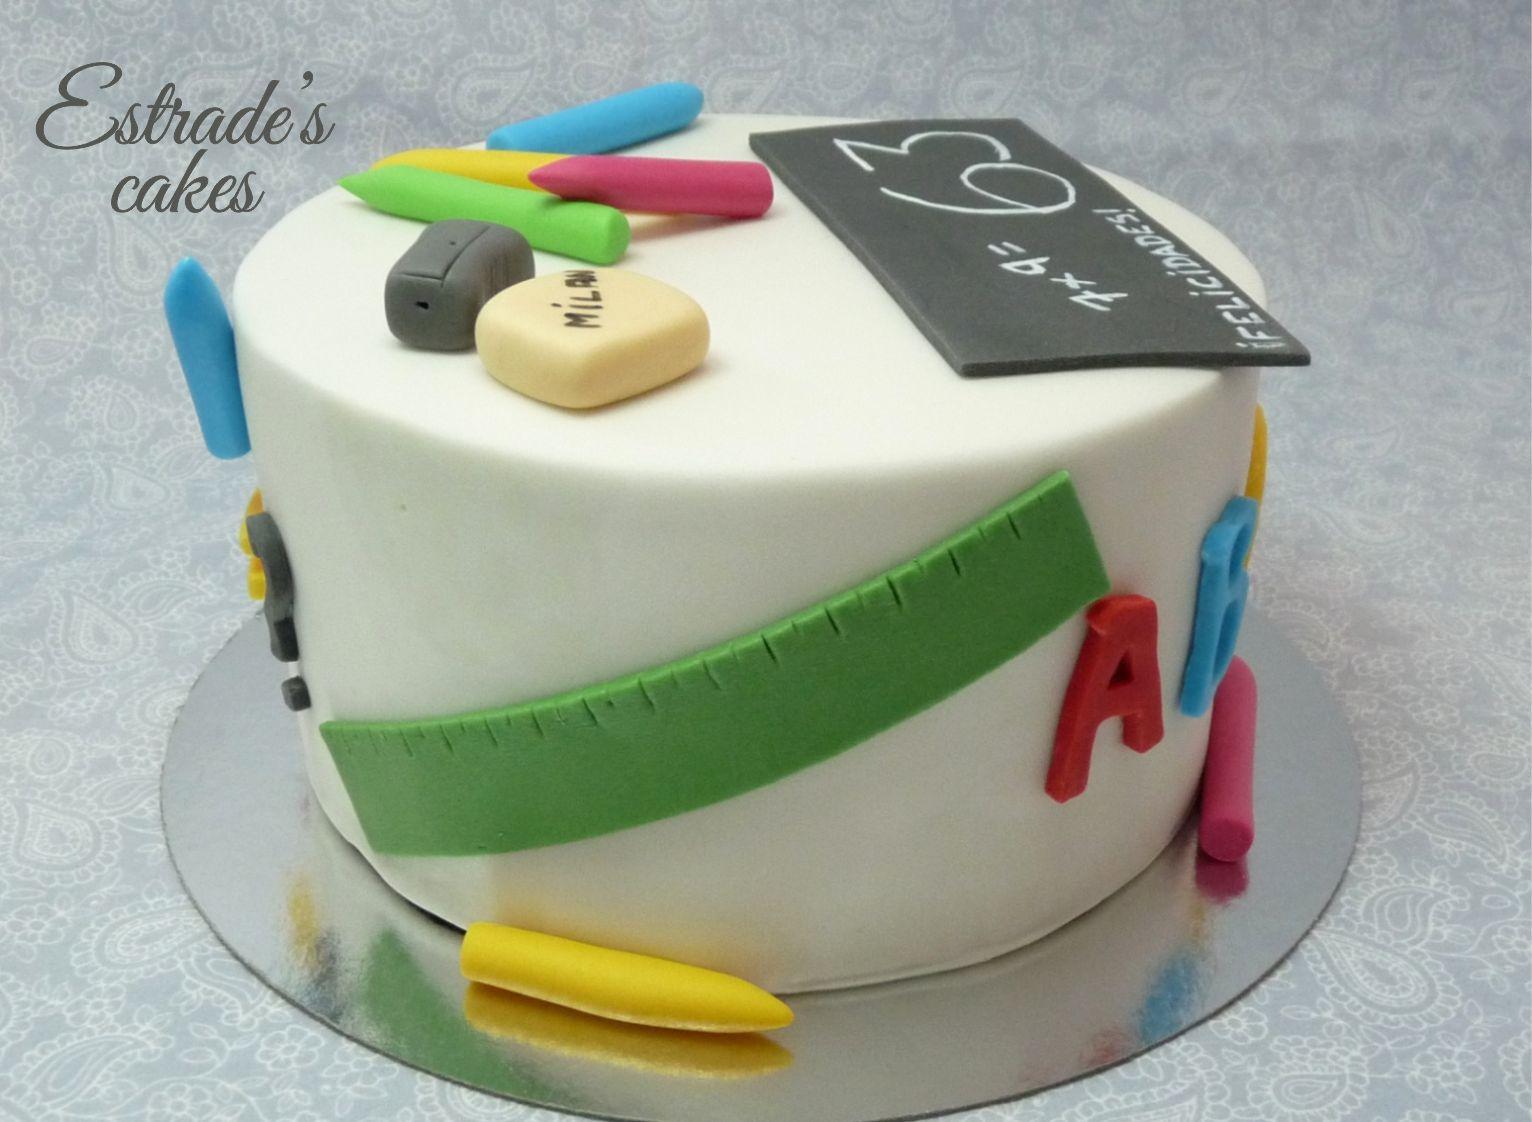 tarta maestro con fondant - 3